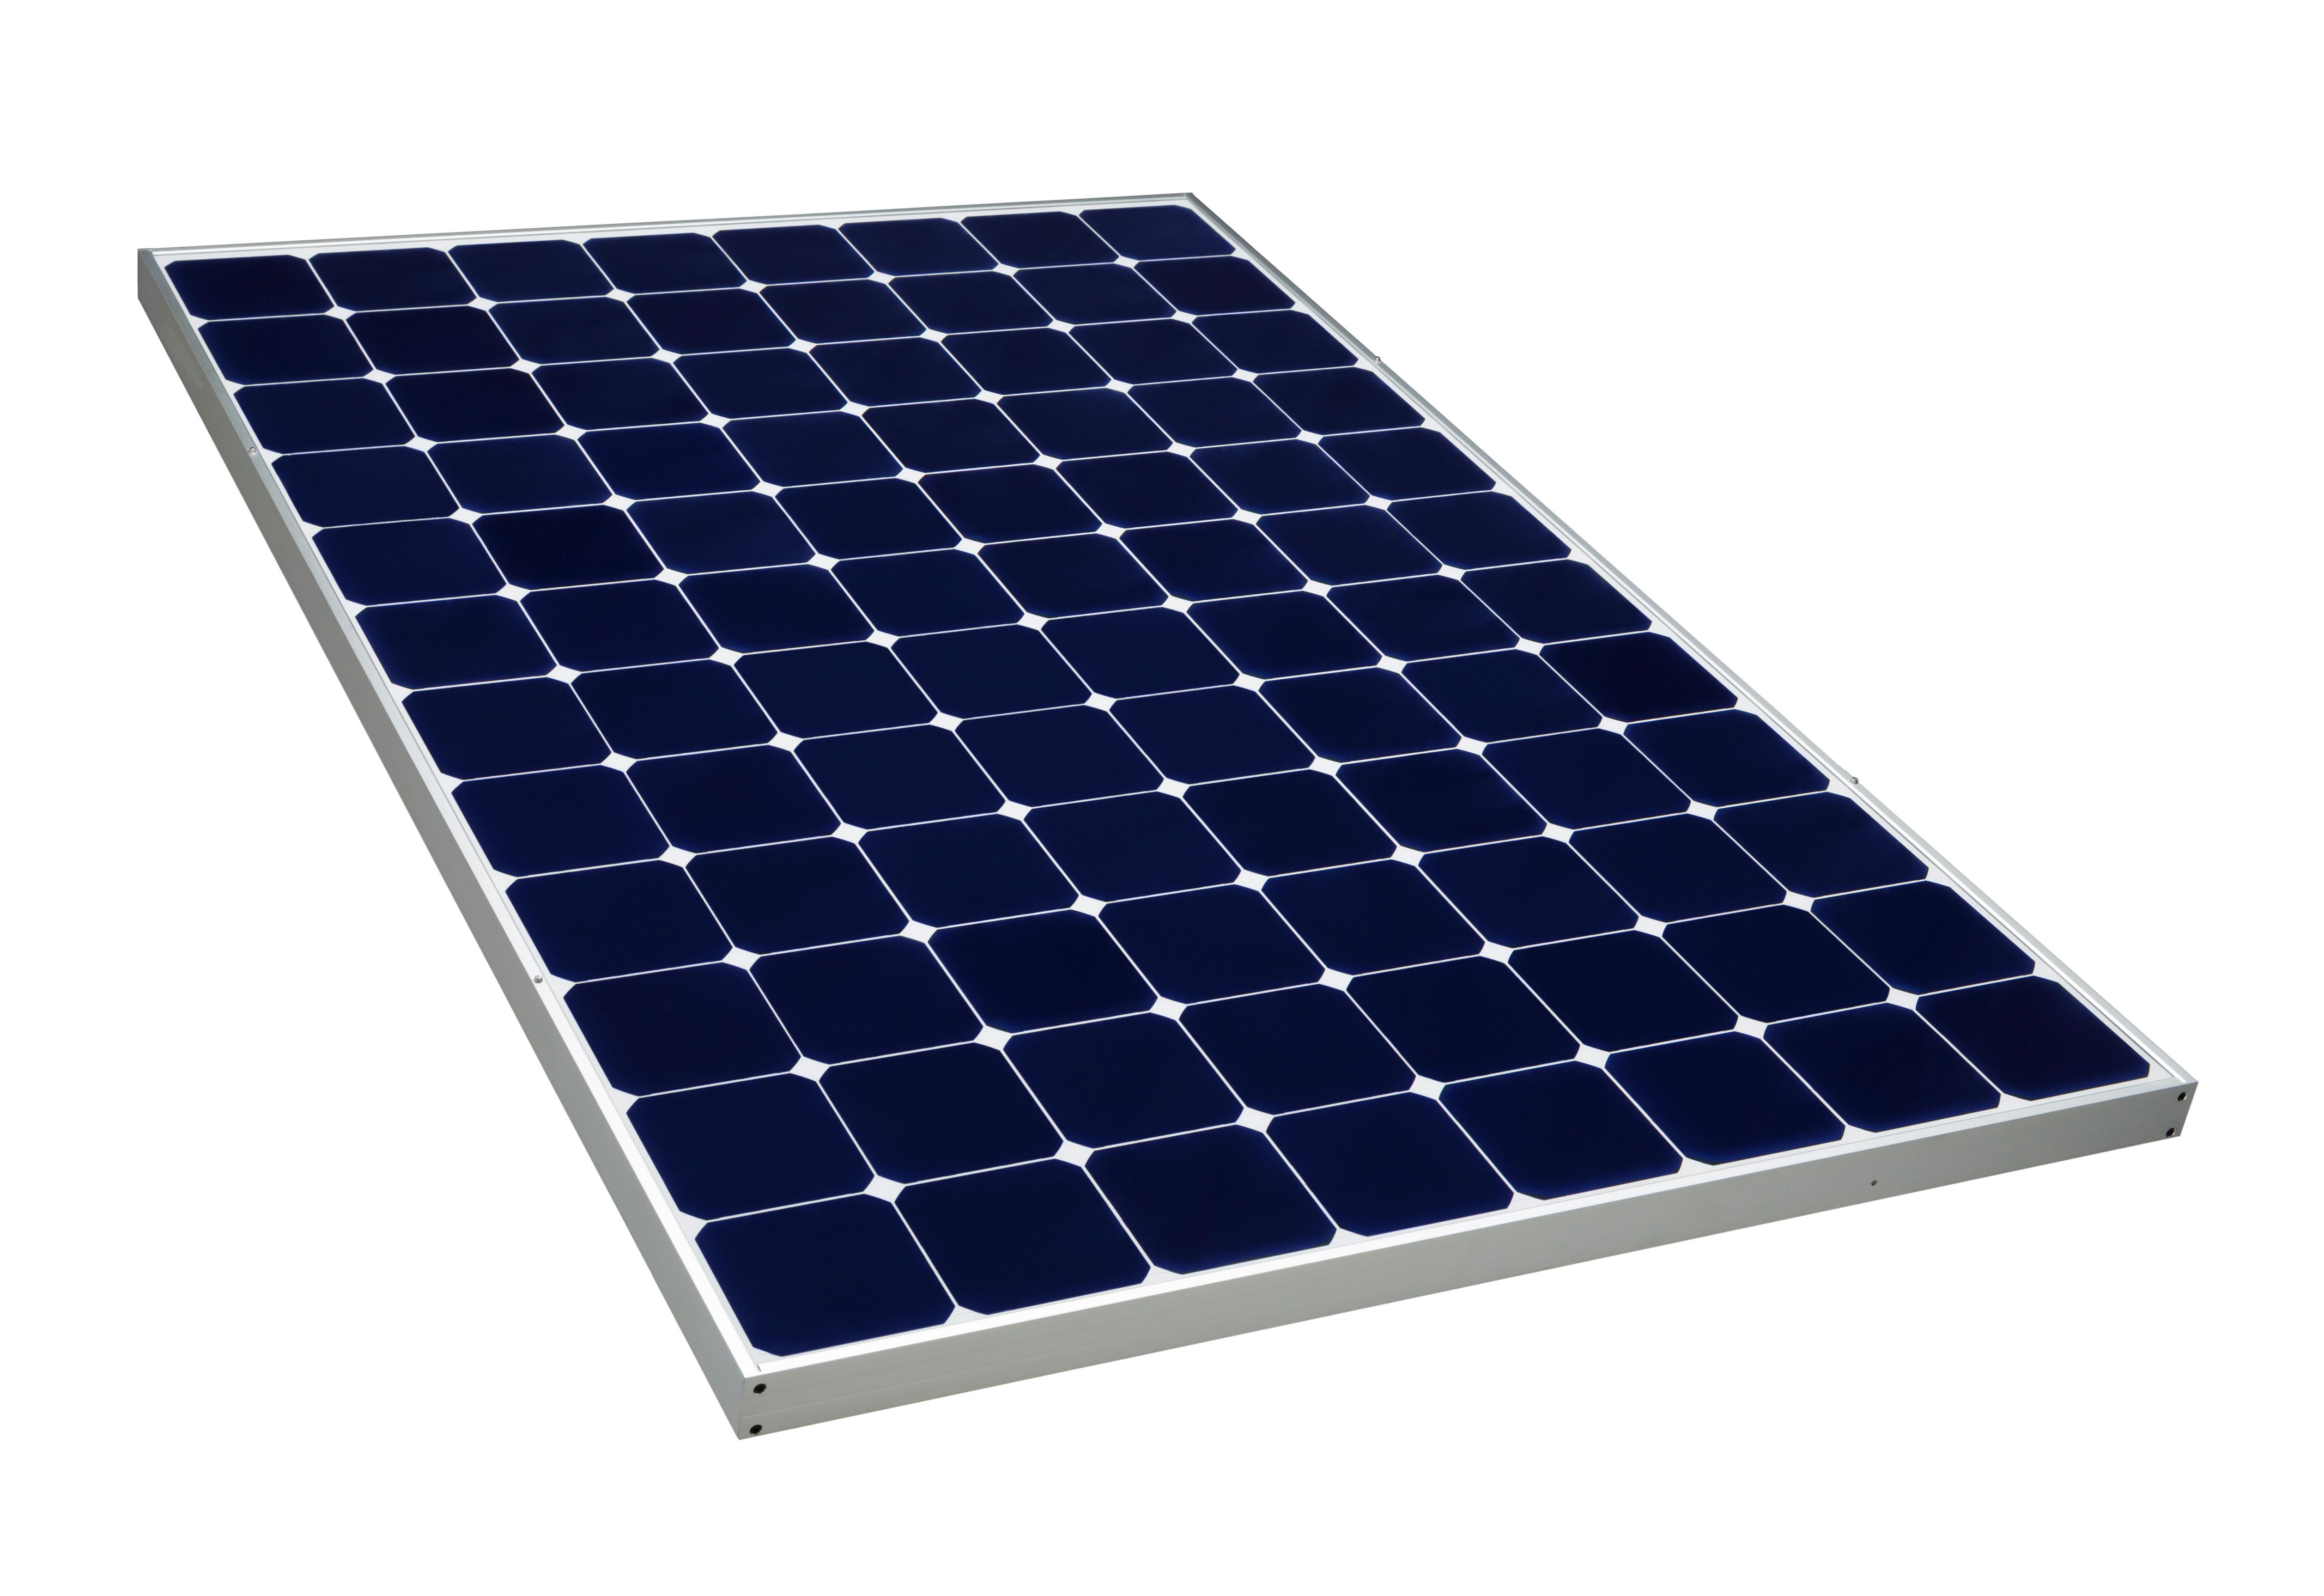 Sunpower S Cradle To Cradle Certified Silver